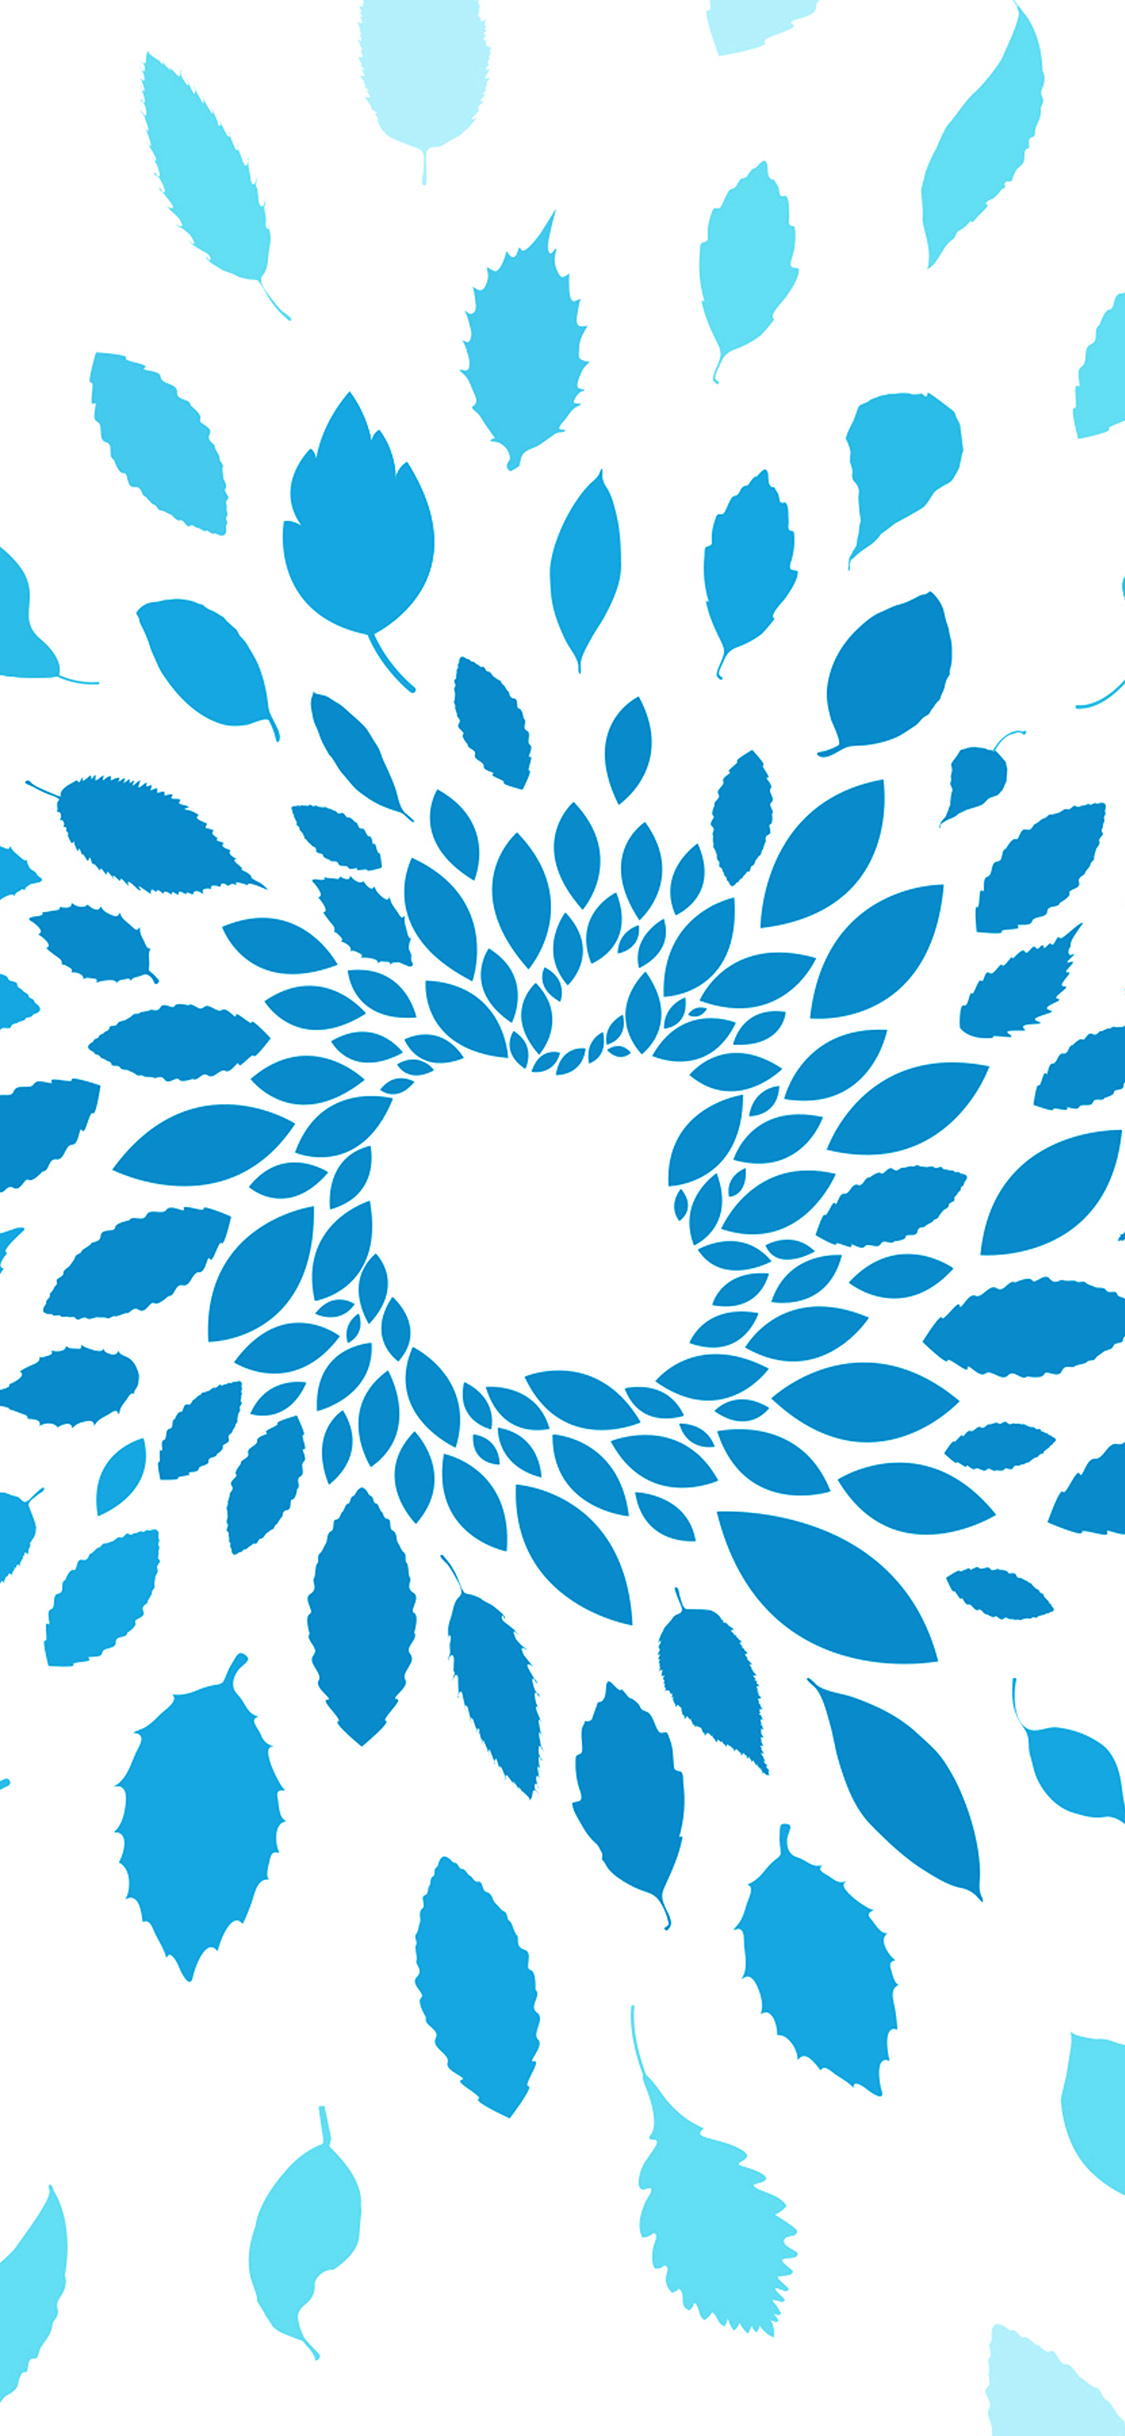 iPhoneXpapers.com-Apple-iPhone-wallpaper-vj77-apple-store-leafs-art-pattern-blue